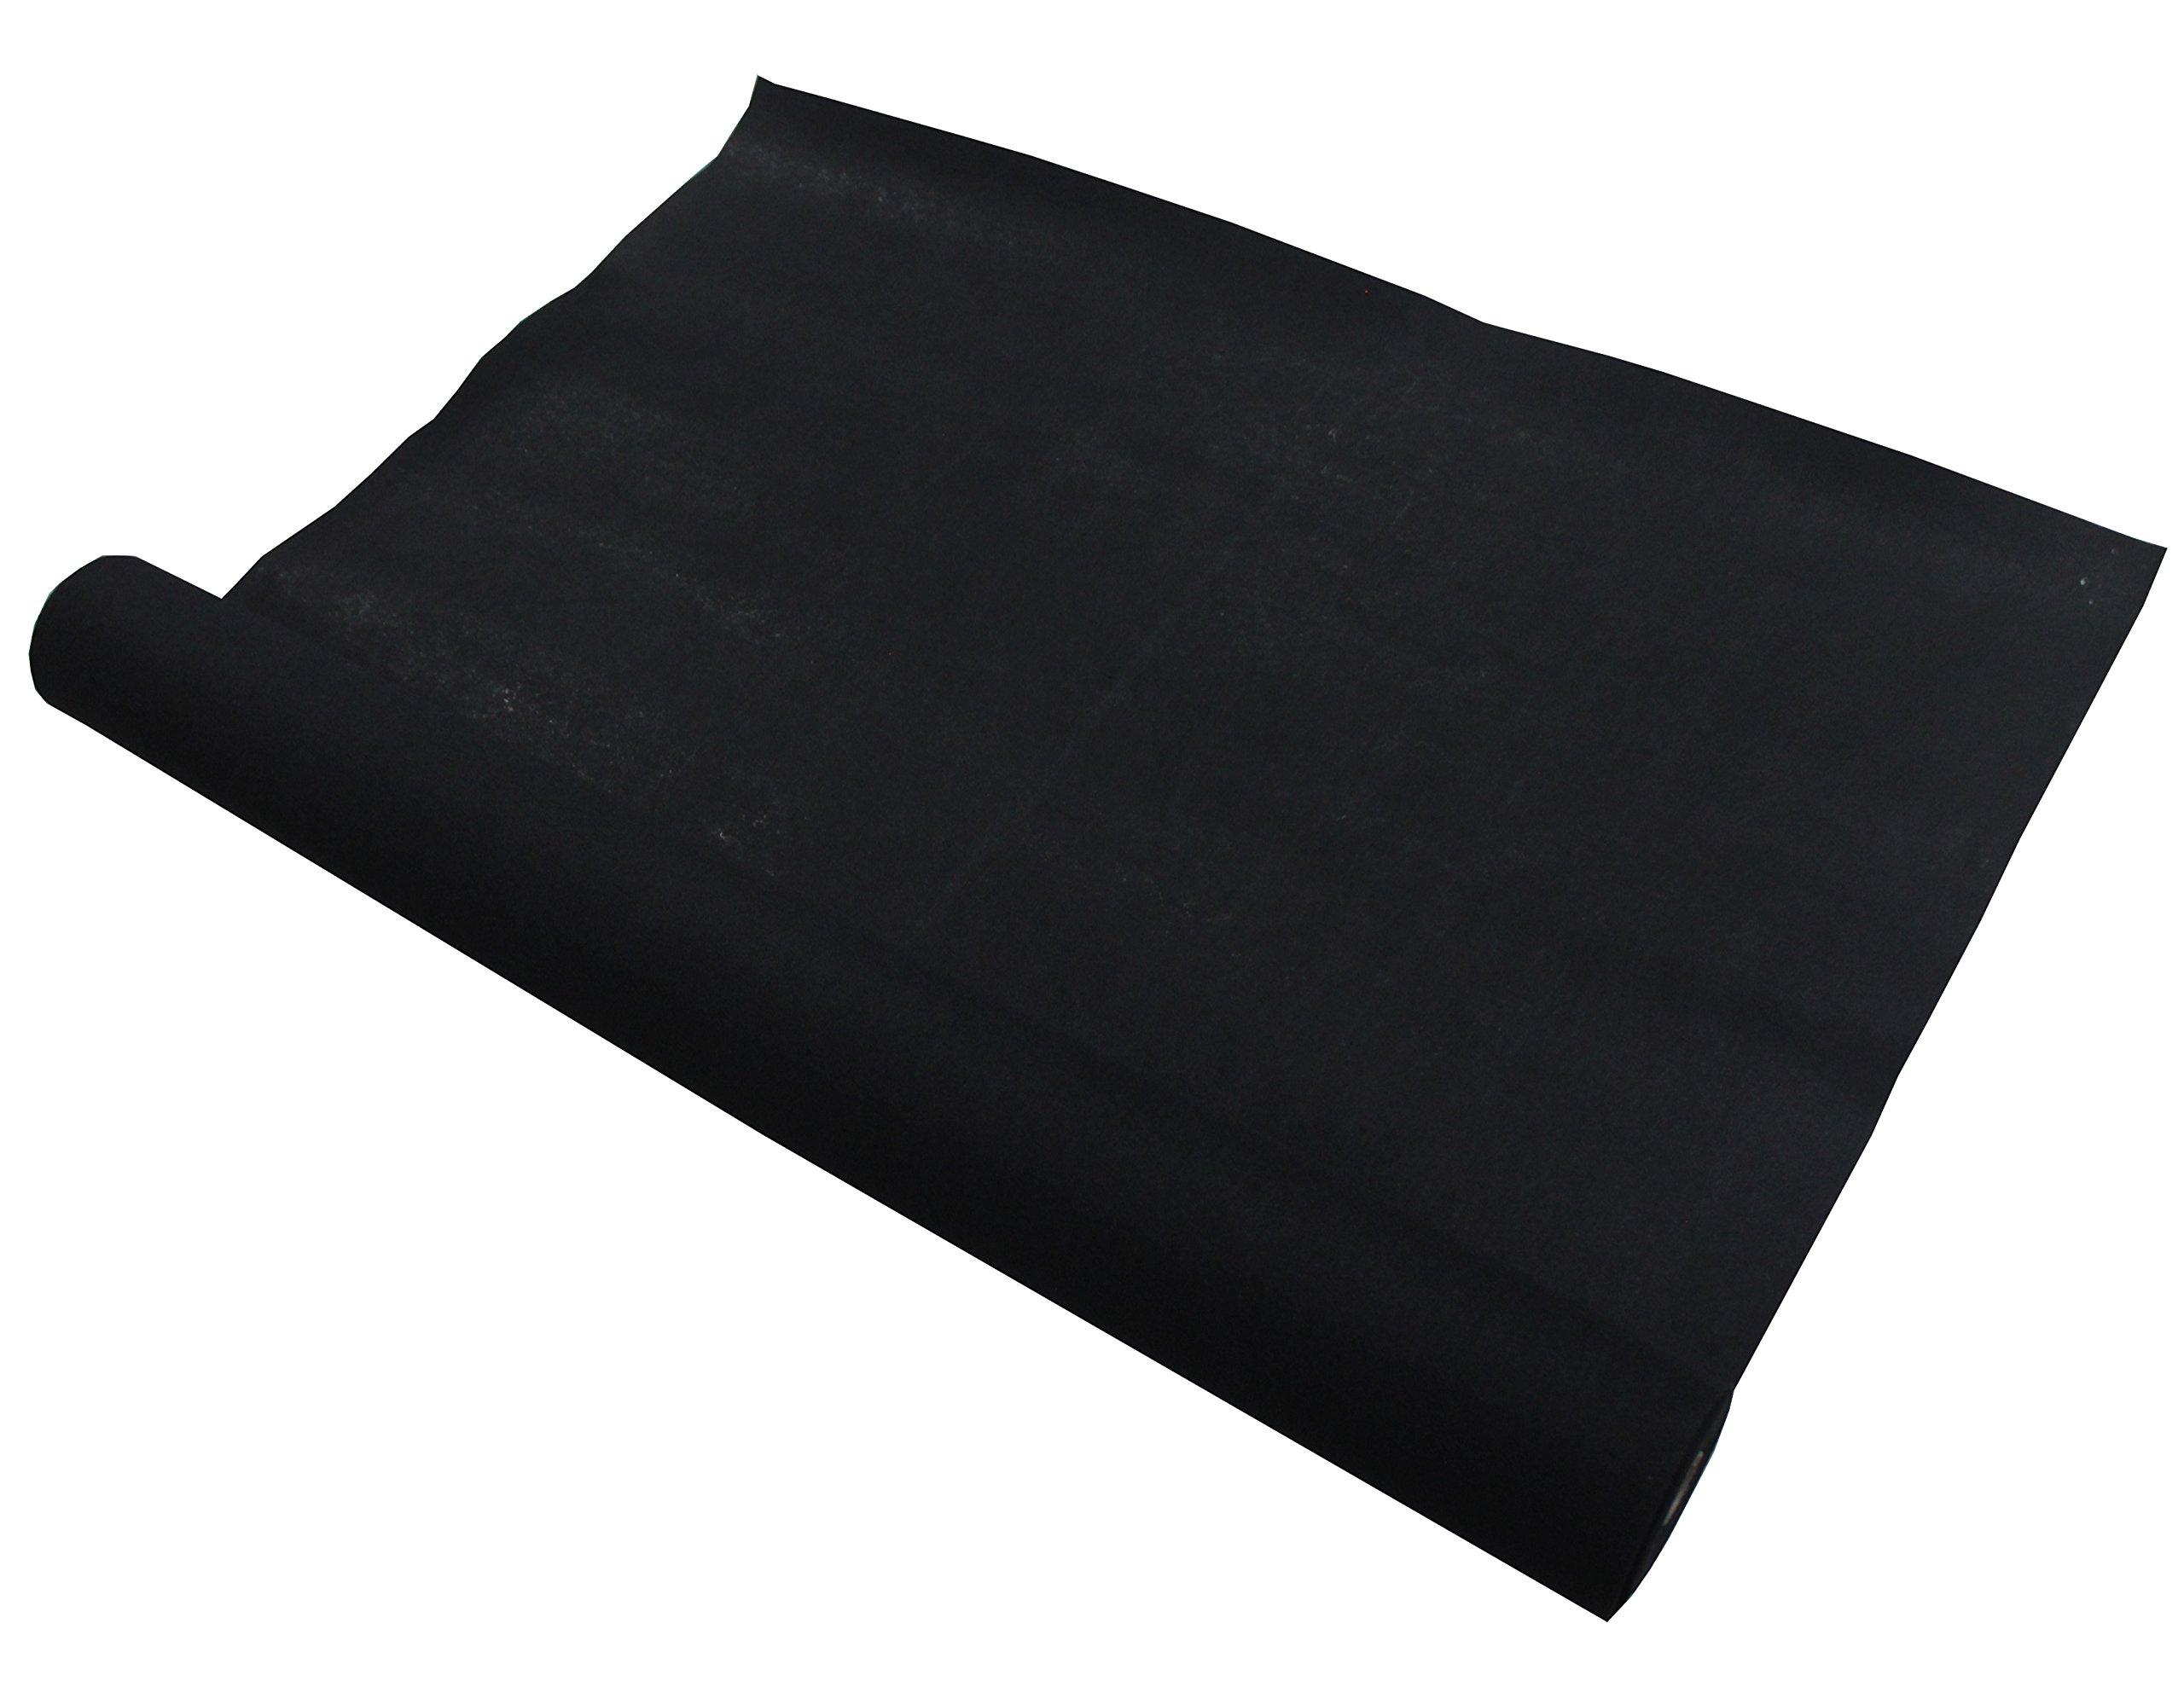 Absolute C15BK 15-Feet Long/4-Feet Wide Black Carpet for Speaker Sub Box Carpet rv Truck Car Trunk Laner by Absolute